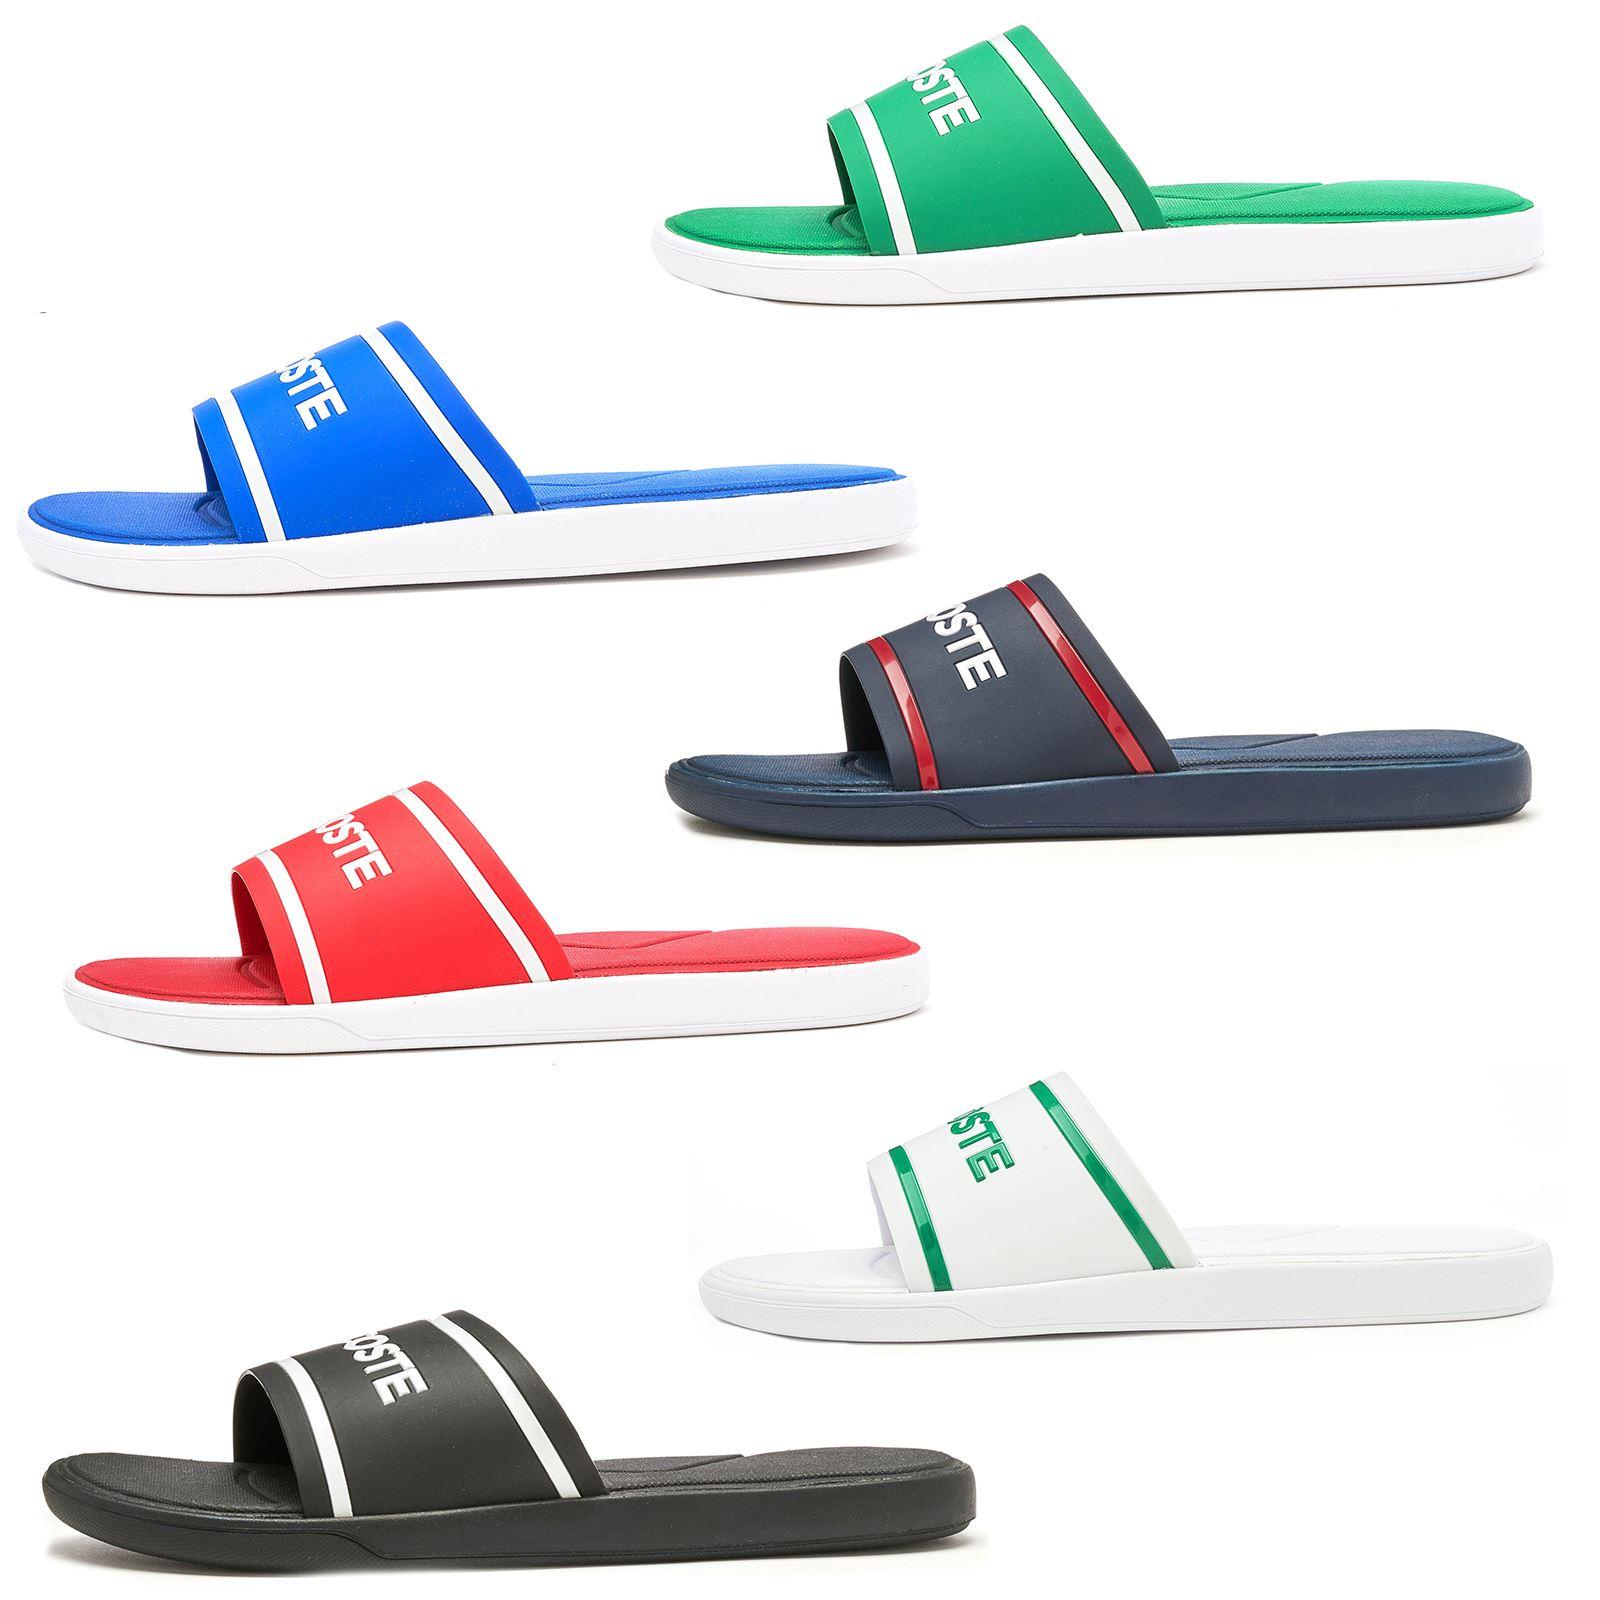 755c83202fb276 Details about Lacoste L.30 Slide Sandals 118   218 CAM in Wide Range of  Colours   Sizes